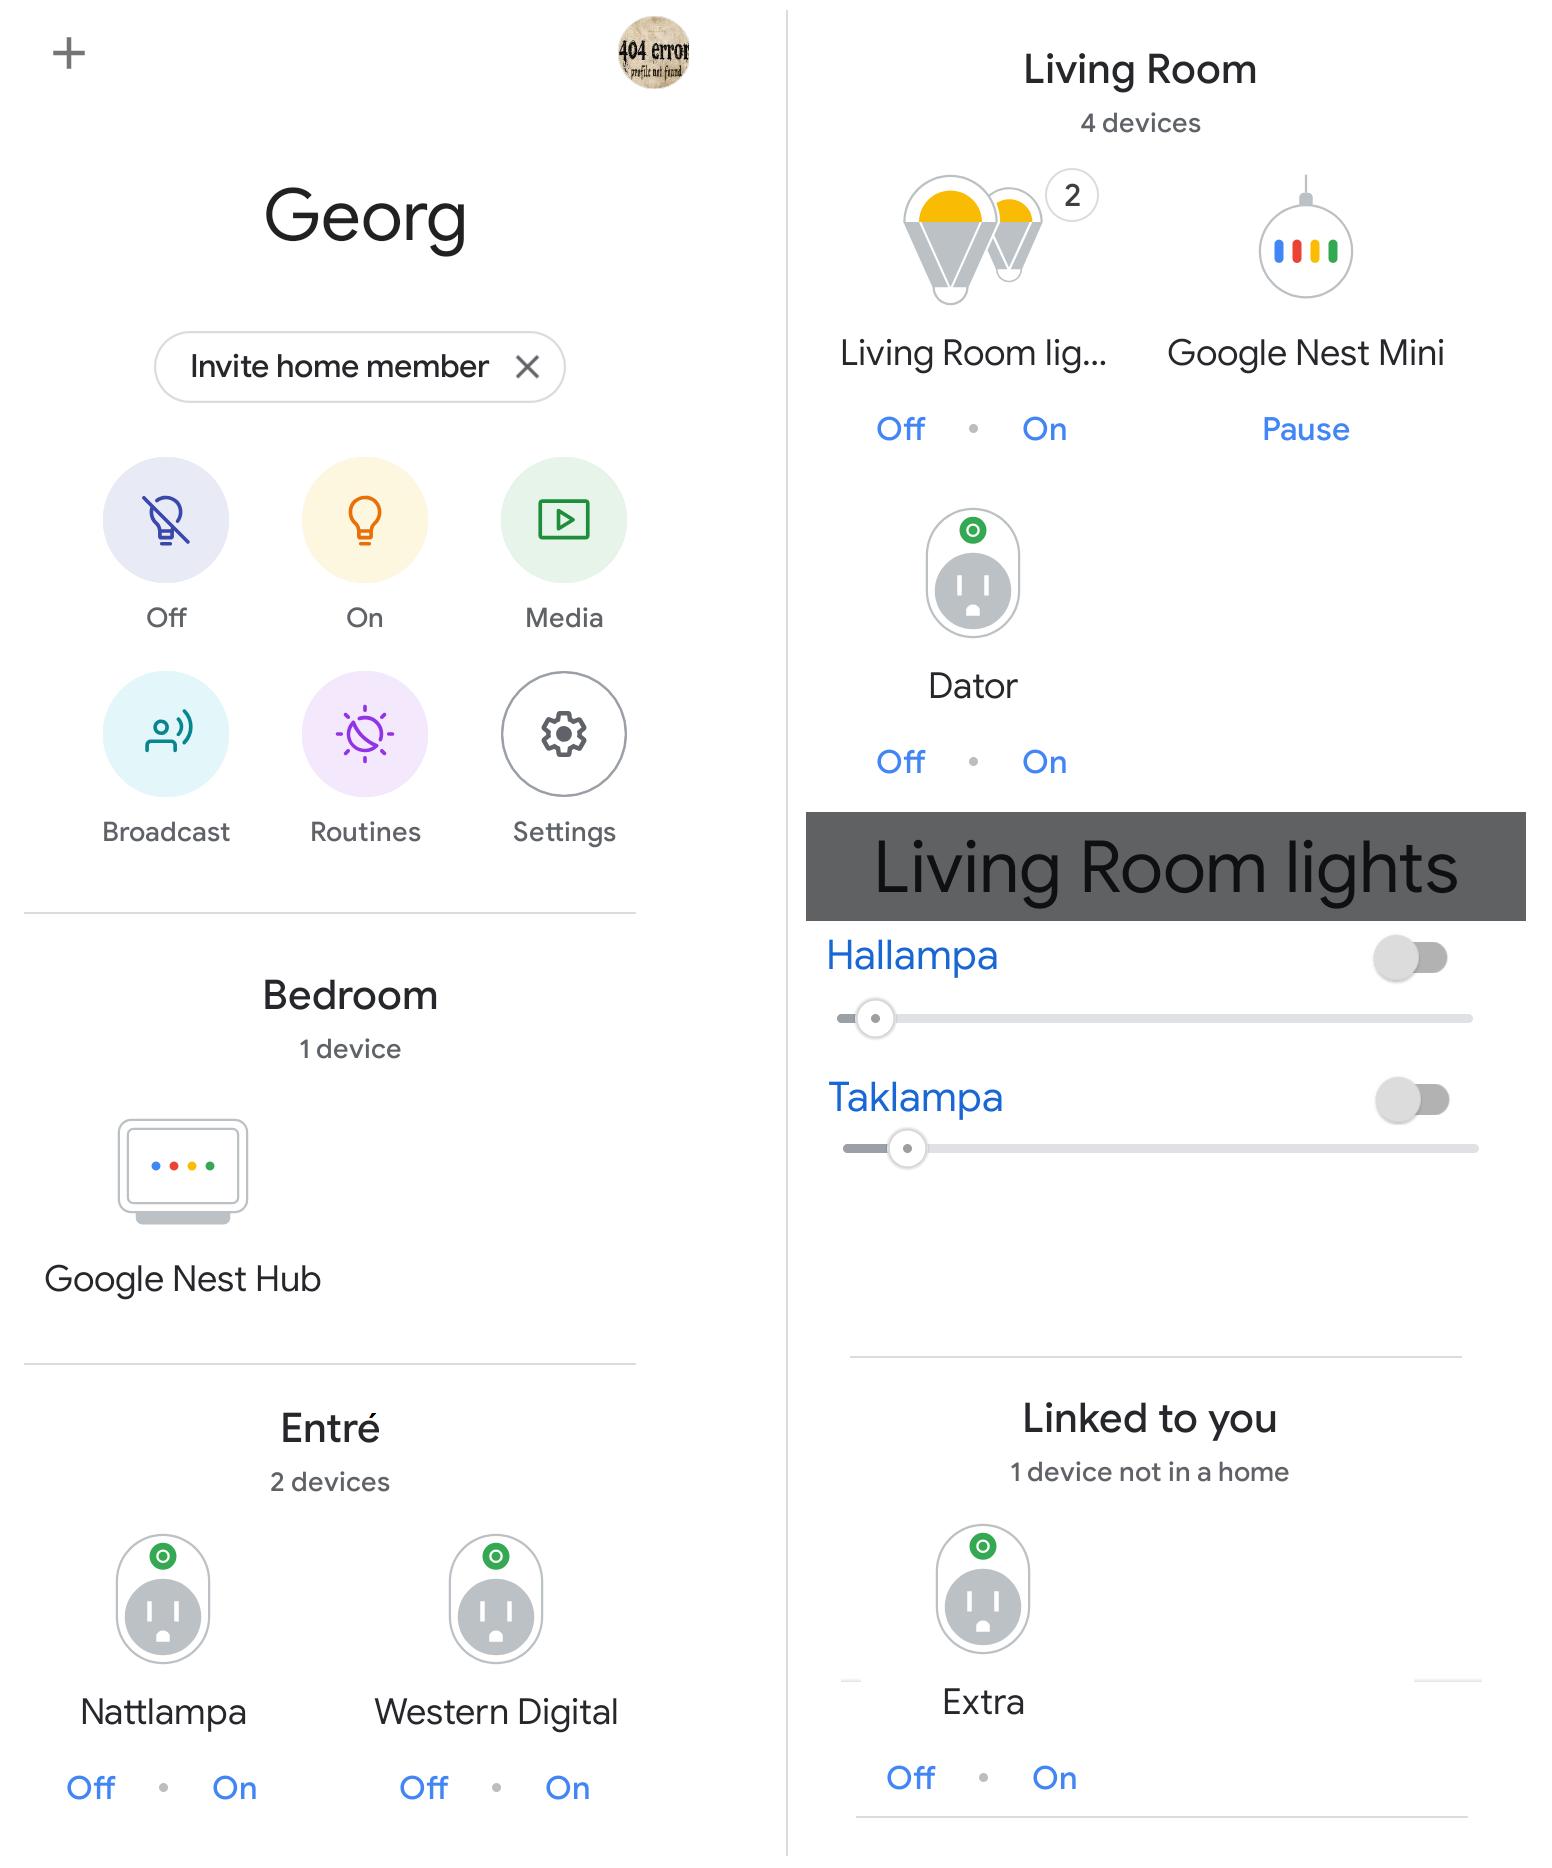 Google Assistant Map.png